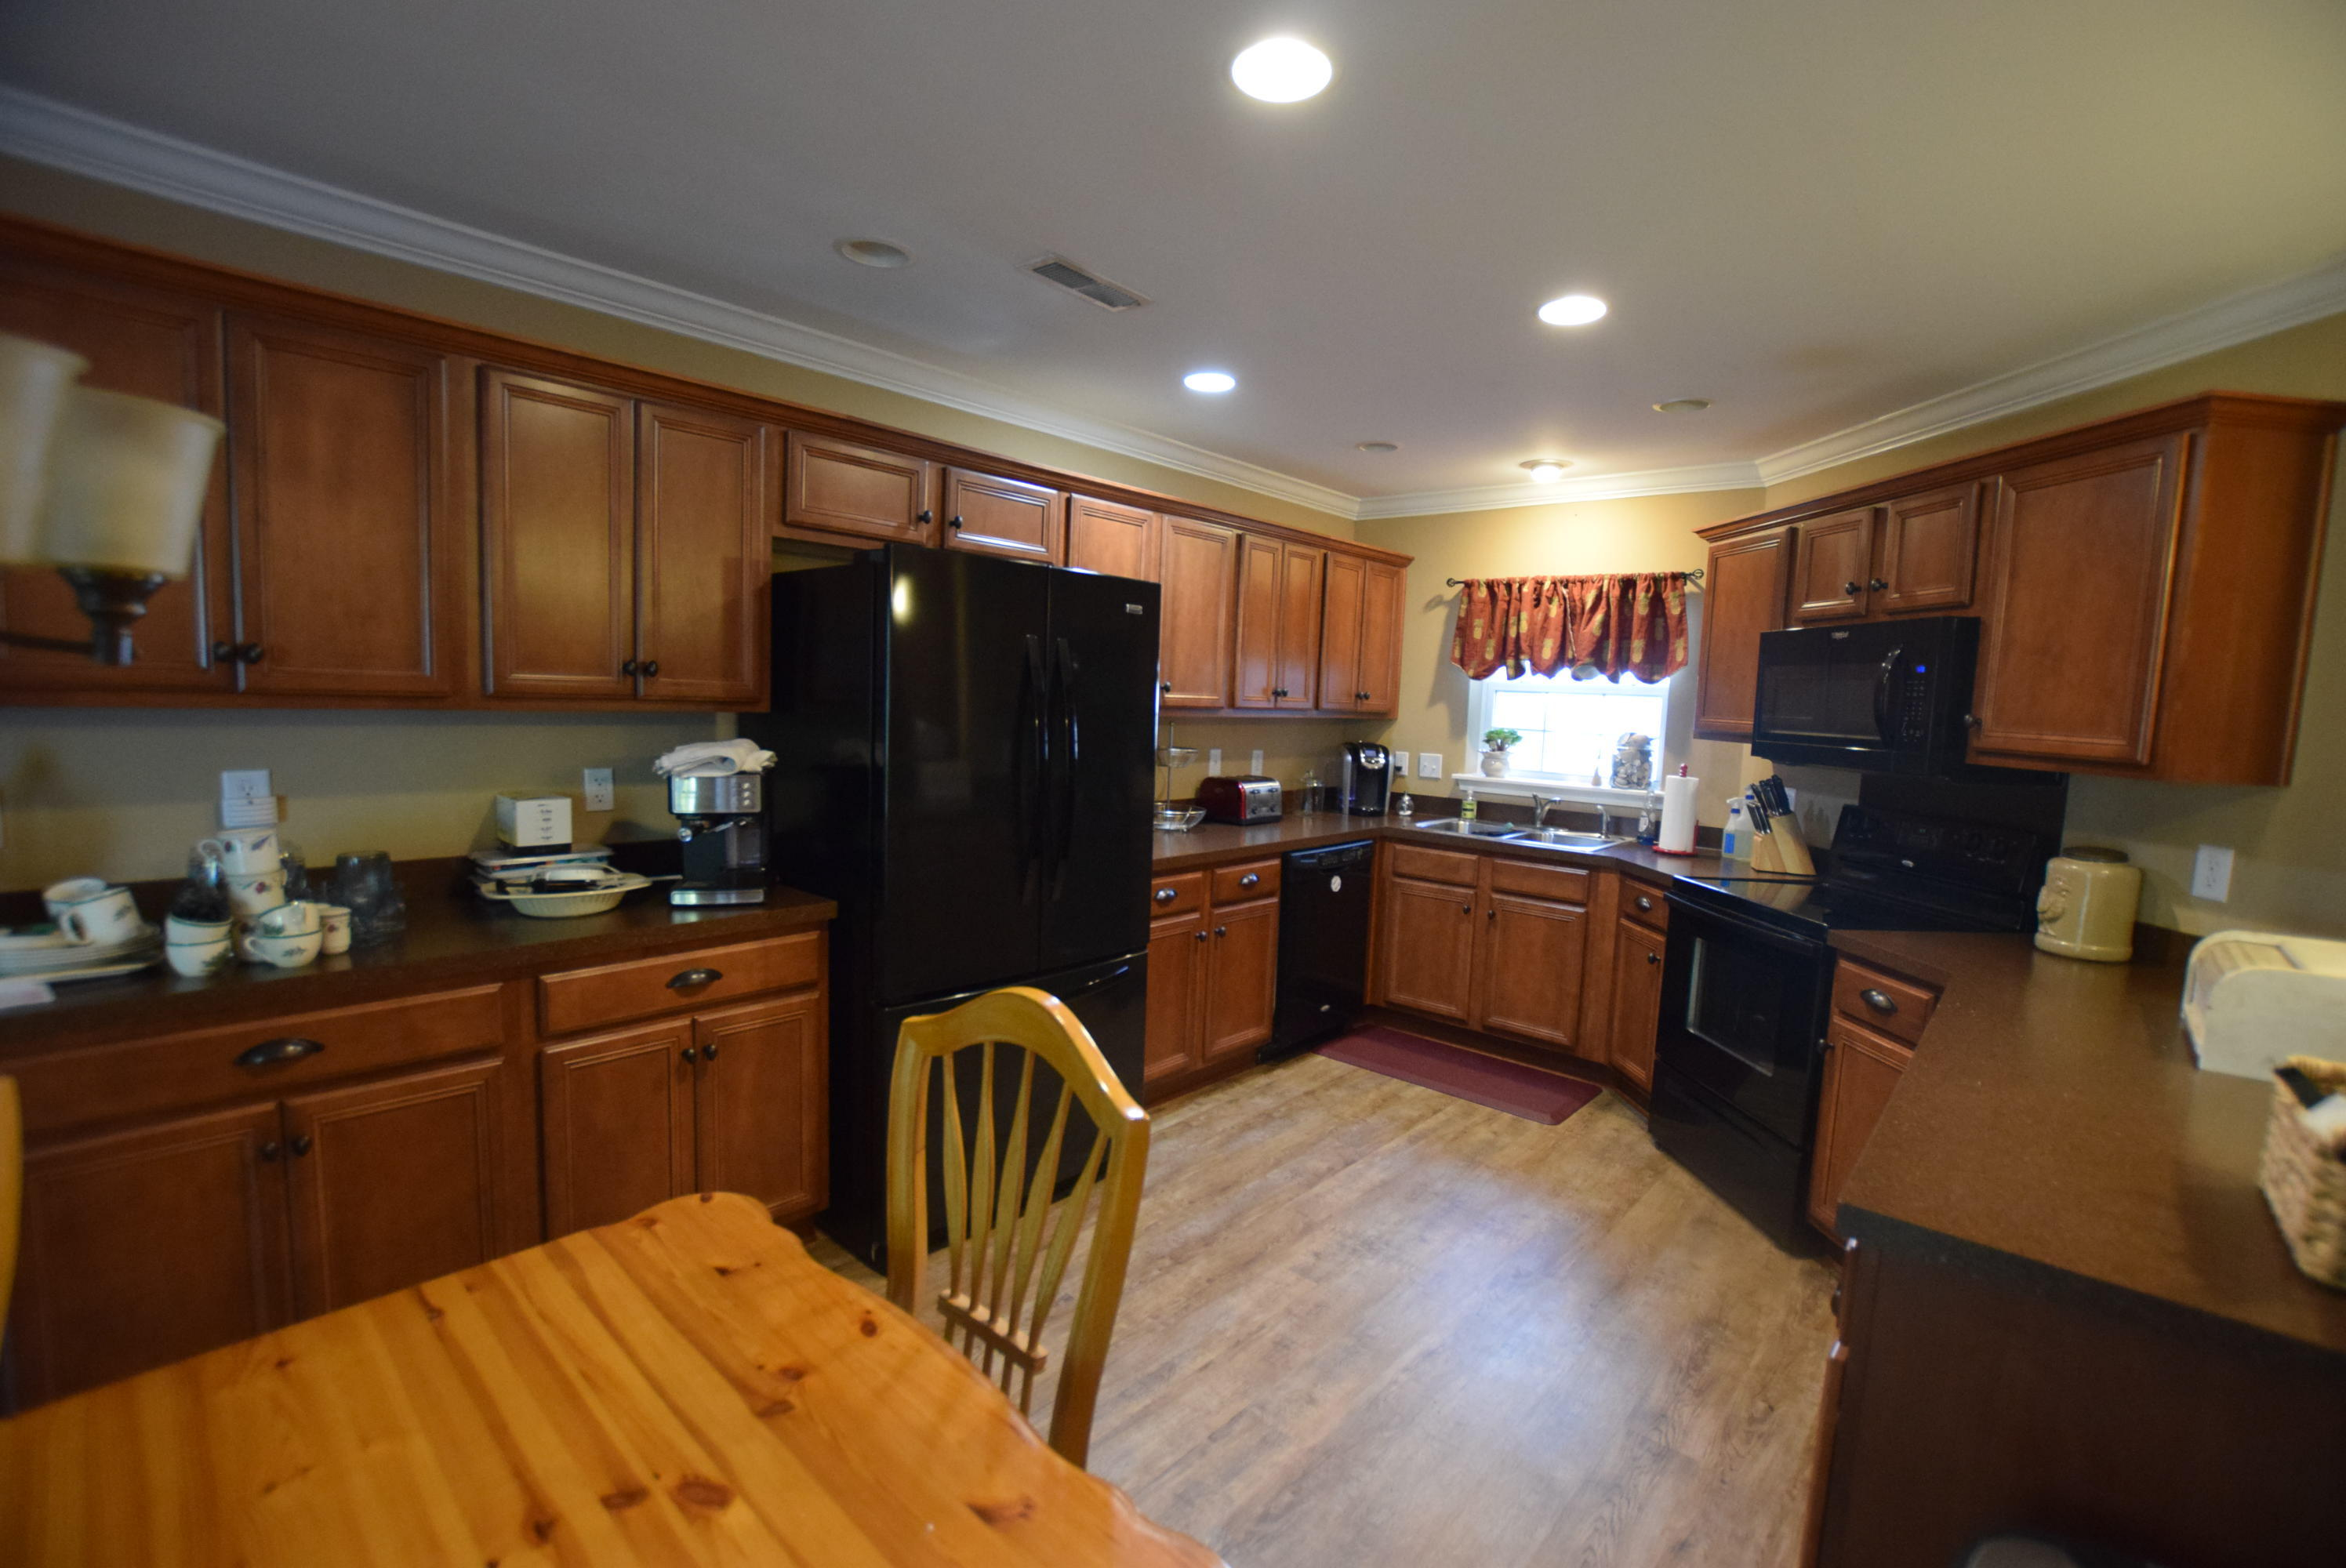 Charleston Park Homes For Sale - 5150 Trump, North Charleston, SC - 13